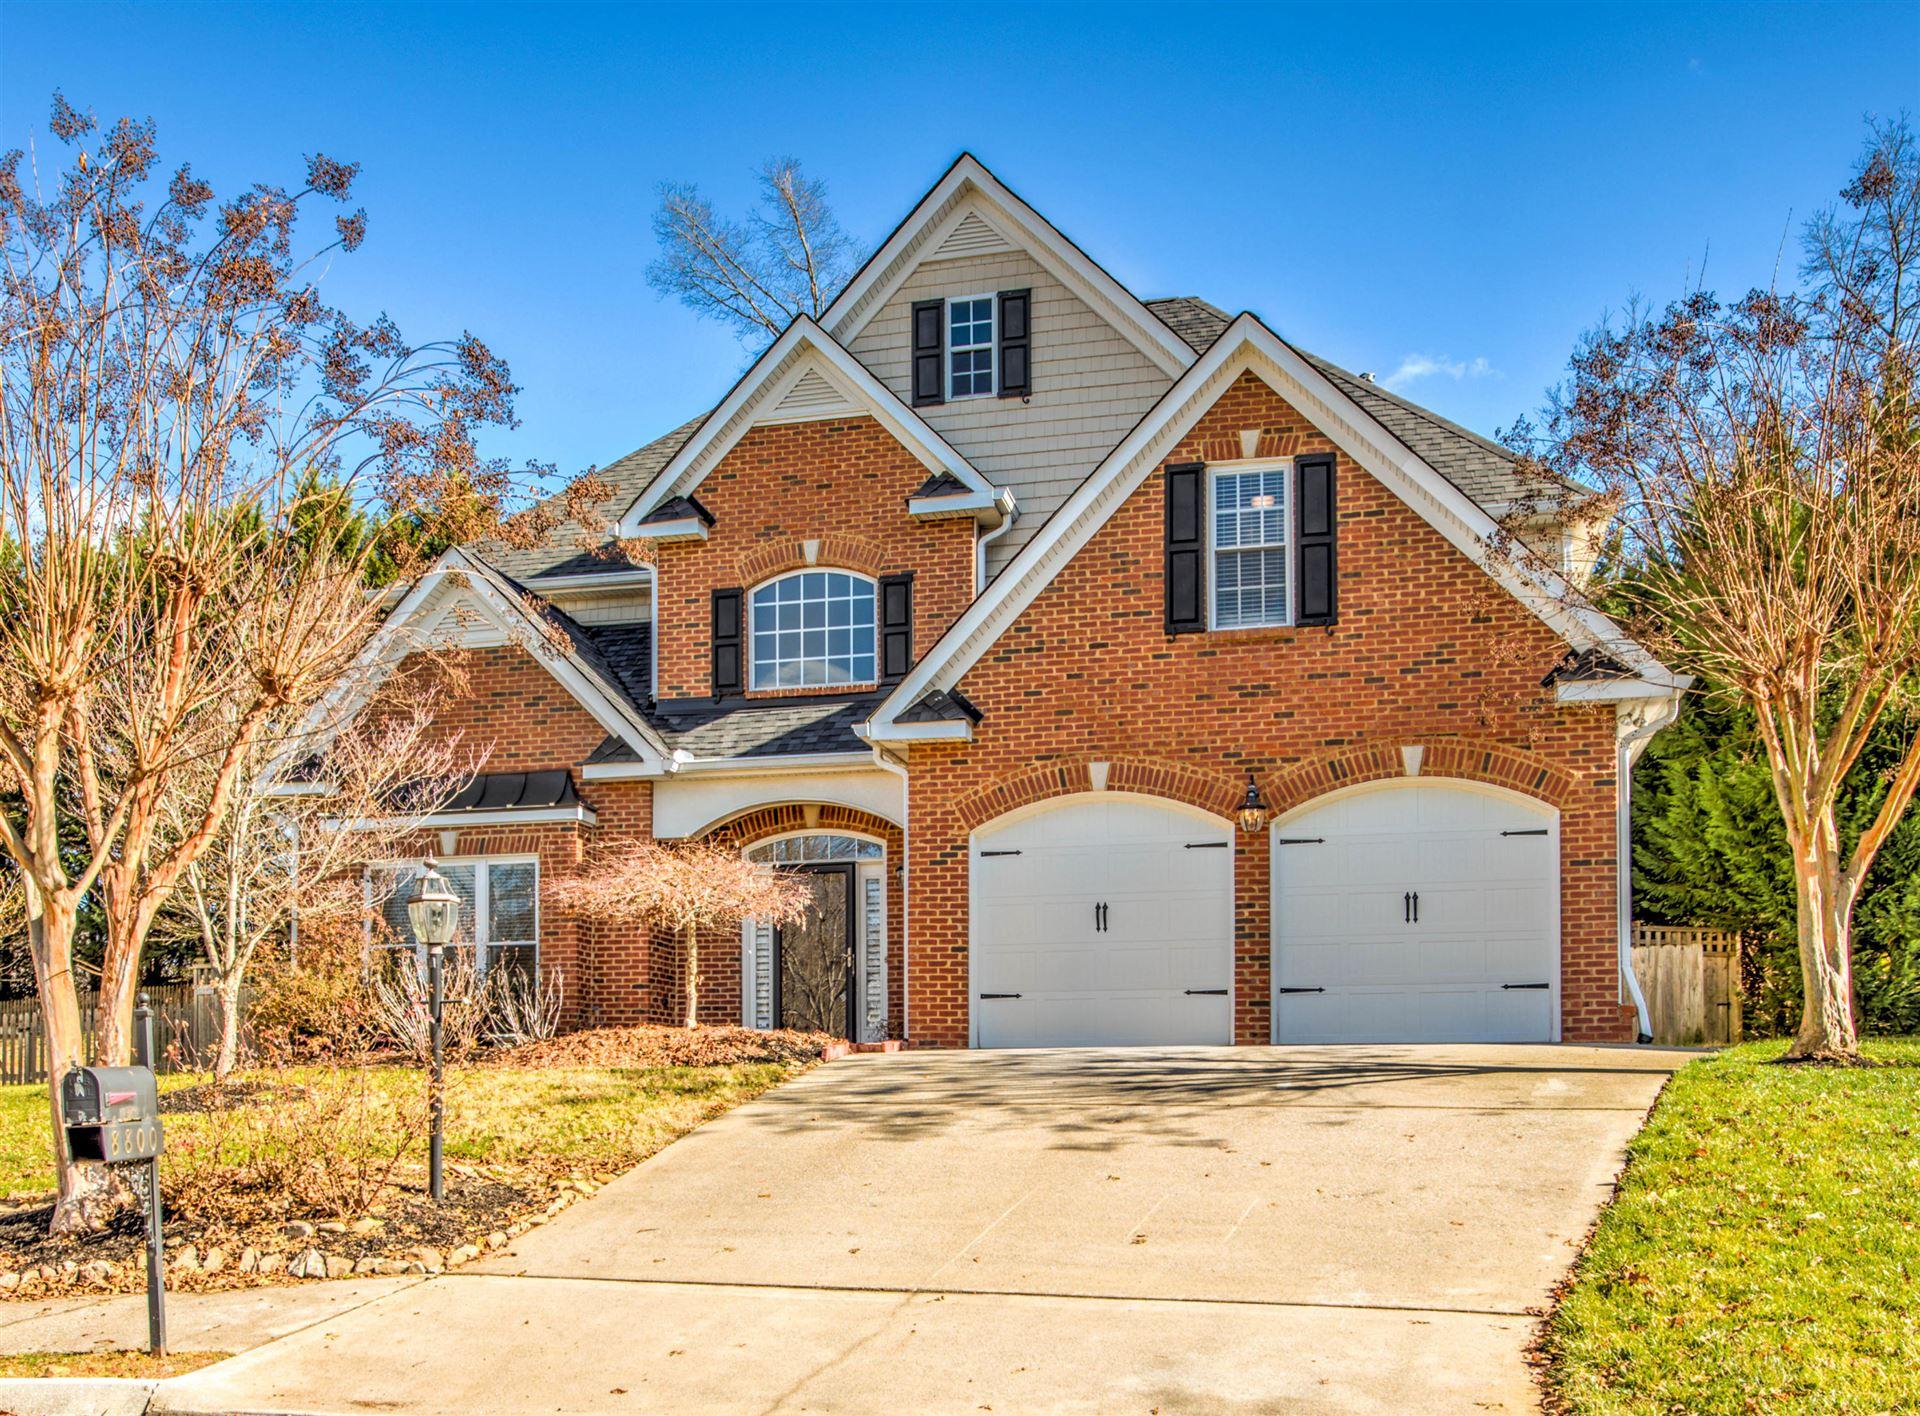 Photo of 8800 Ebenezer Oaks Lane, Knoxville, TN 37922 (MLS # 1140163)